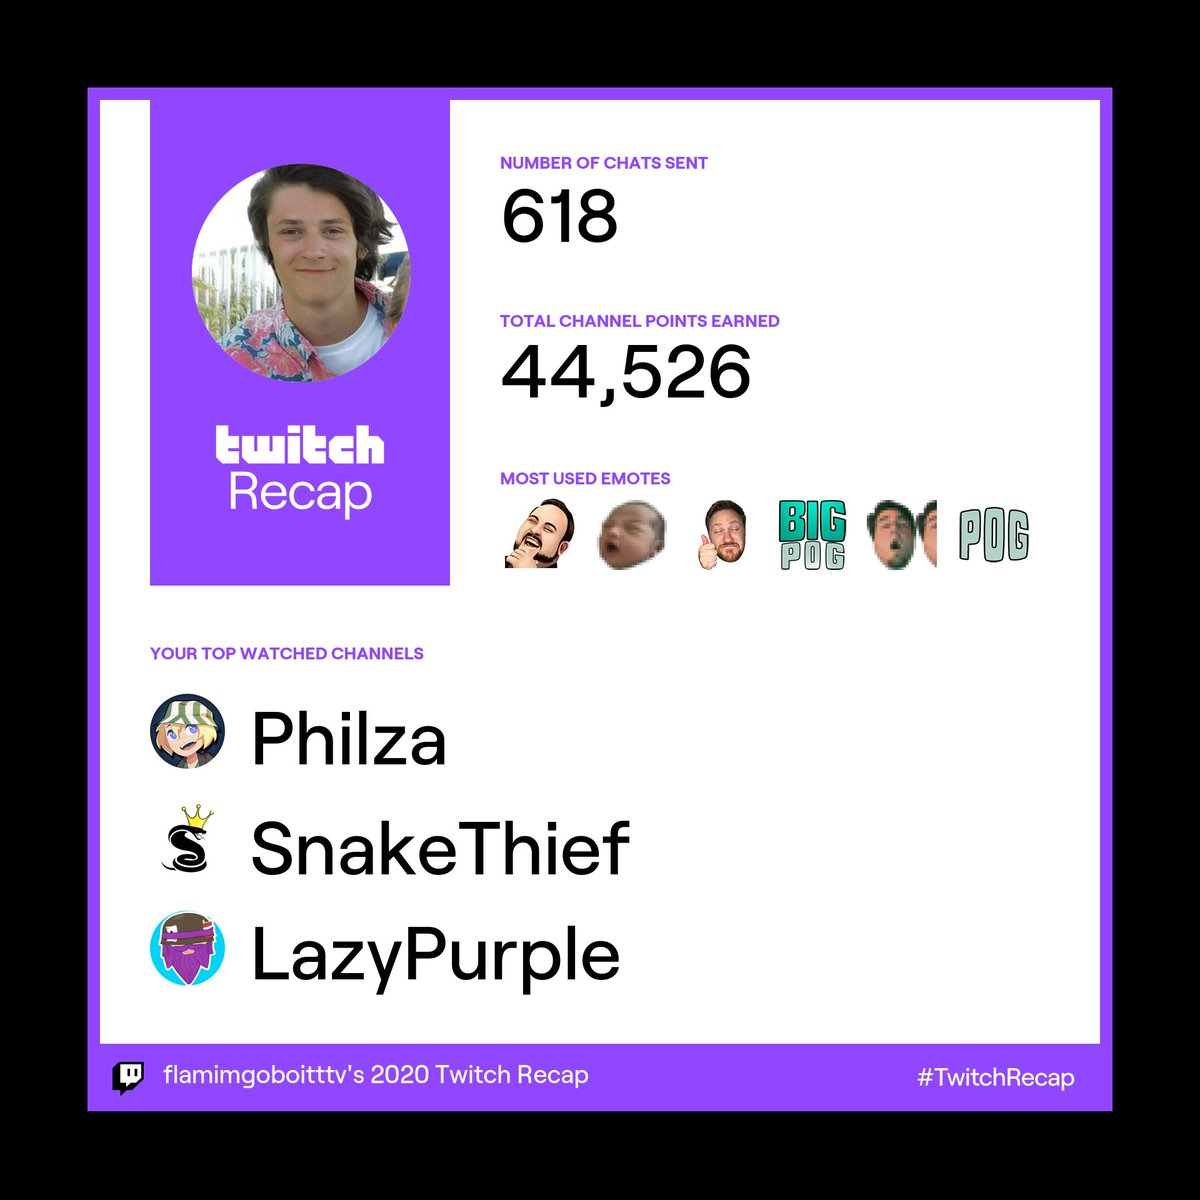 @Ph1LzA @lucasmeldrum123 @LazyandPurple big philza minecraft fan #TwitchRecap